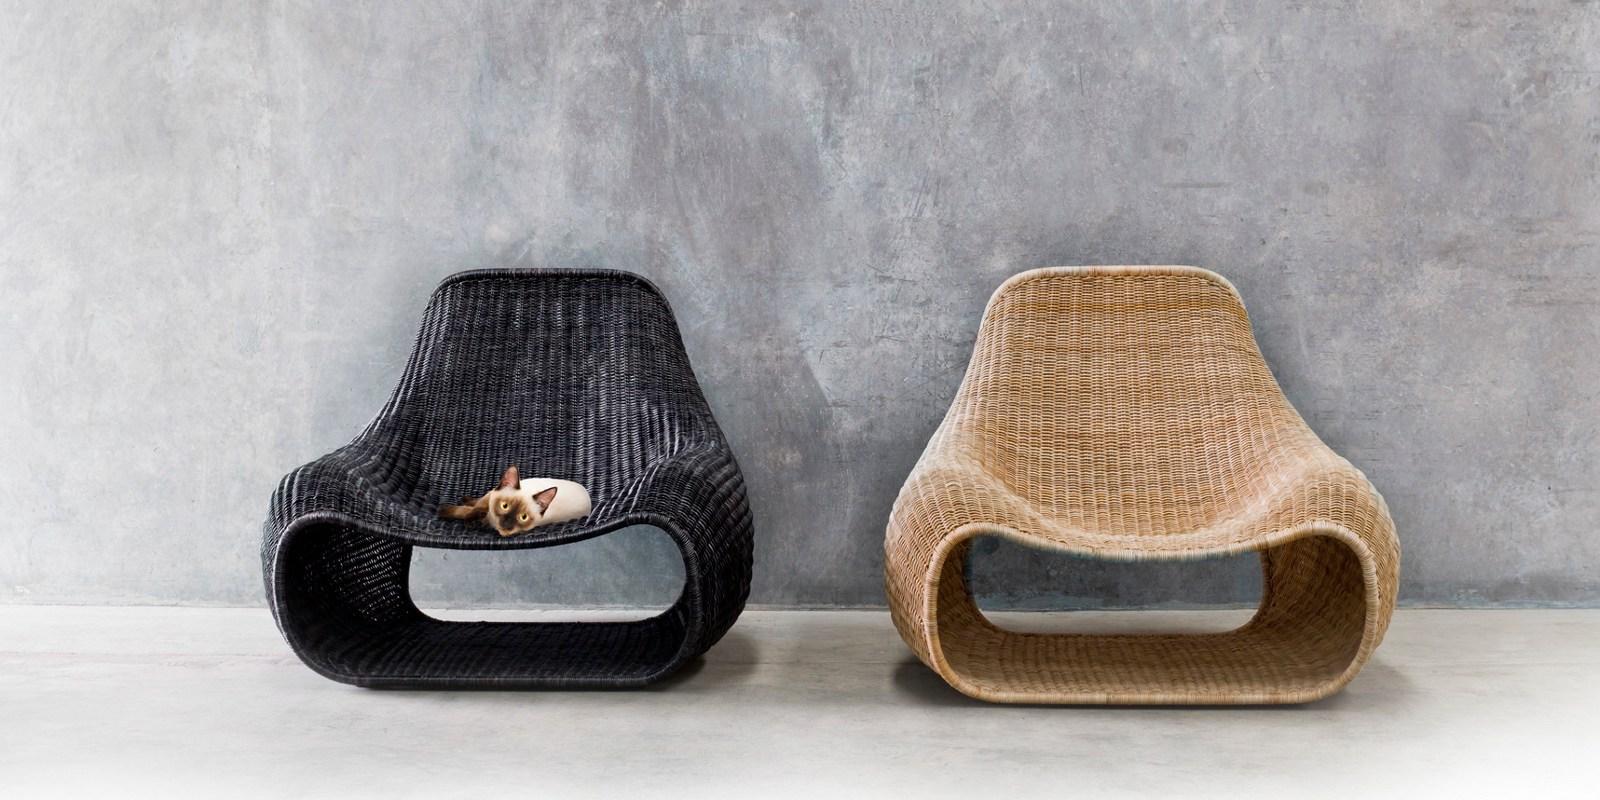 feelgood-designs-snug-lounge-chair-lifestyle.jpeg